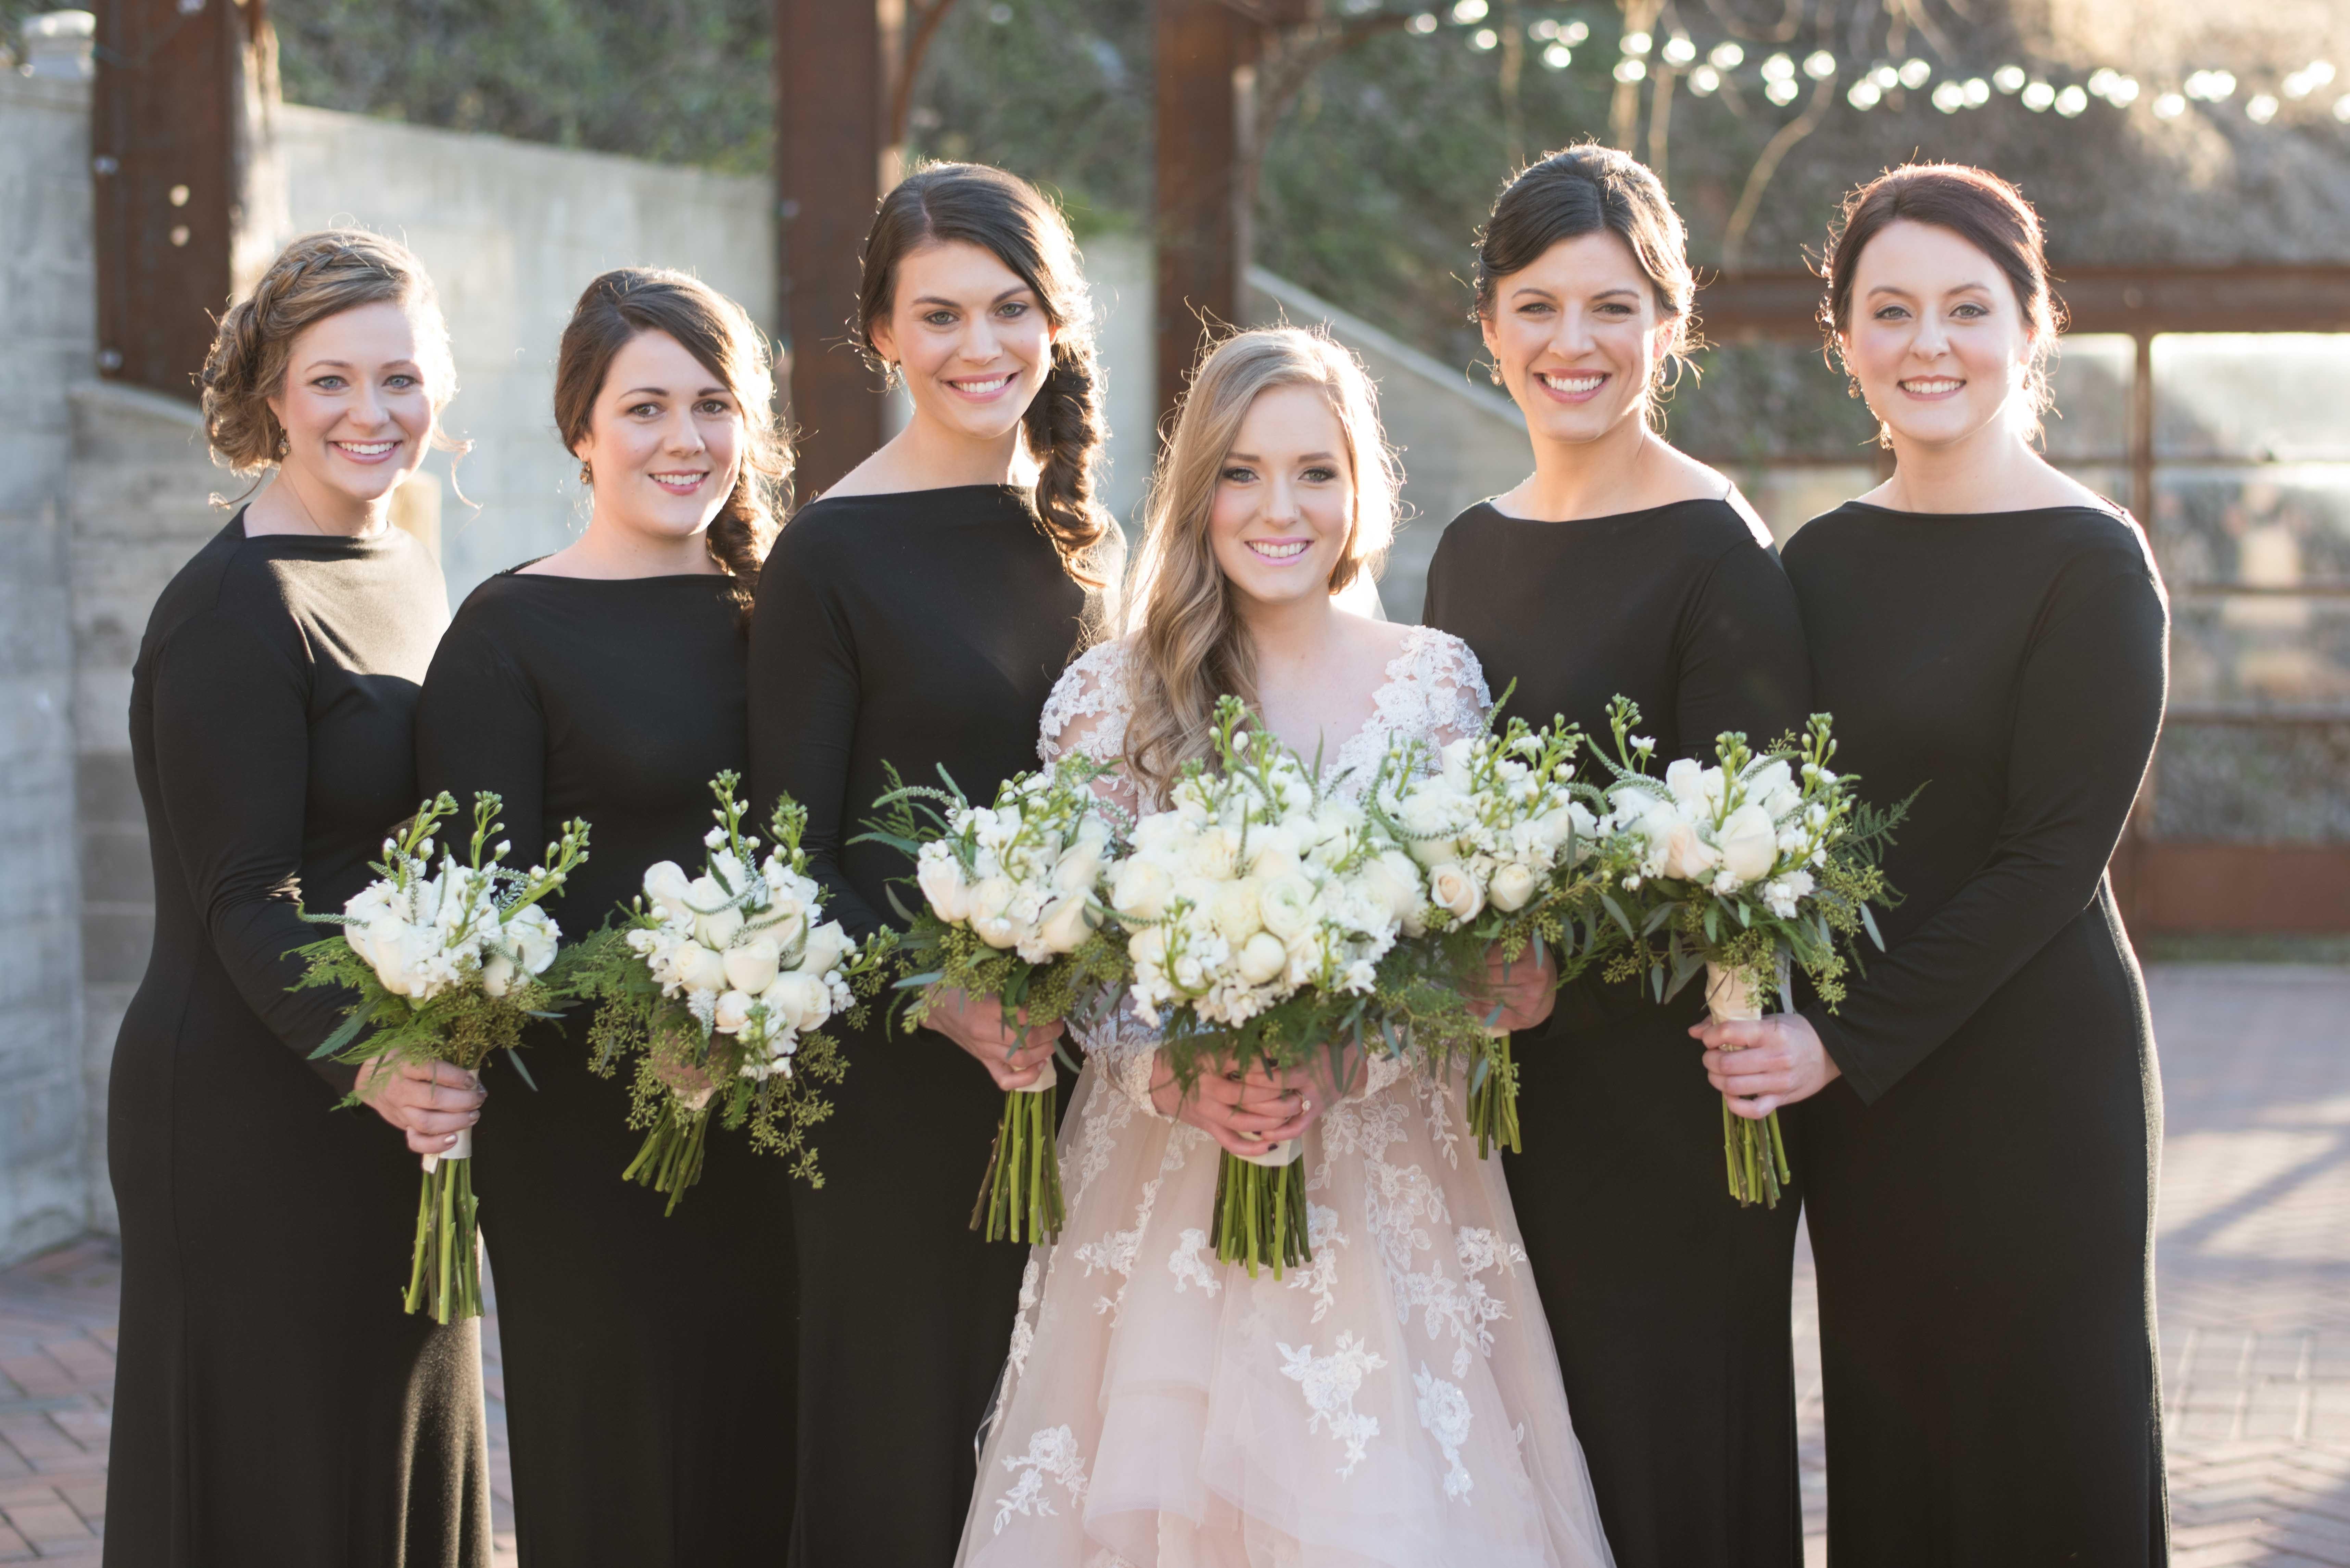 Black bridesmaid gowns.